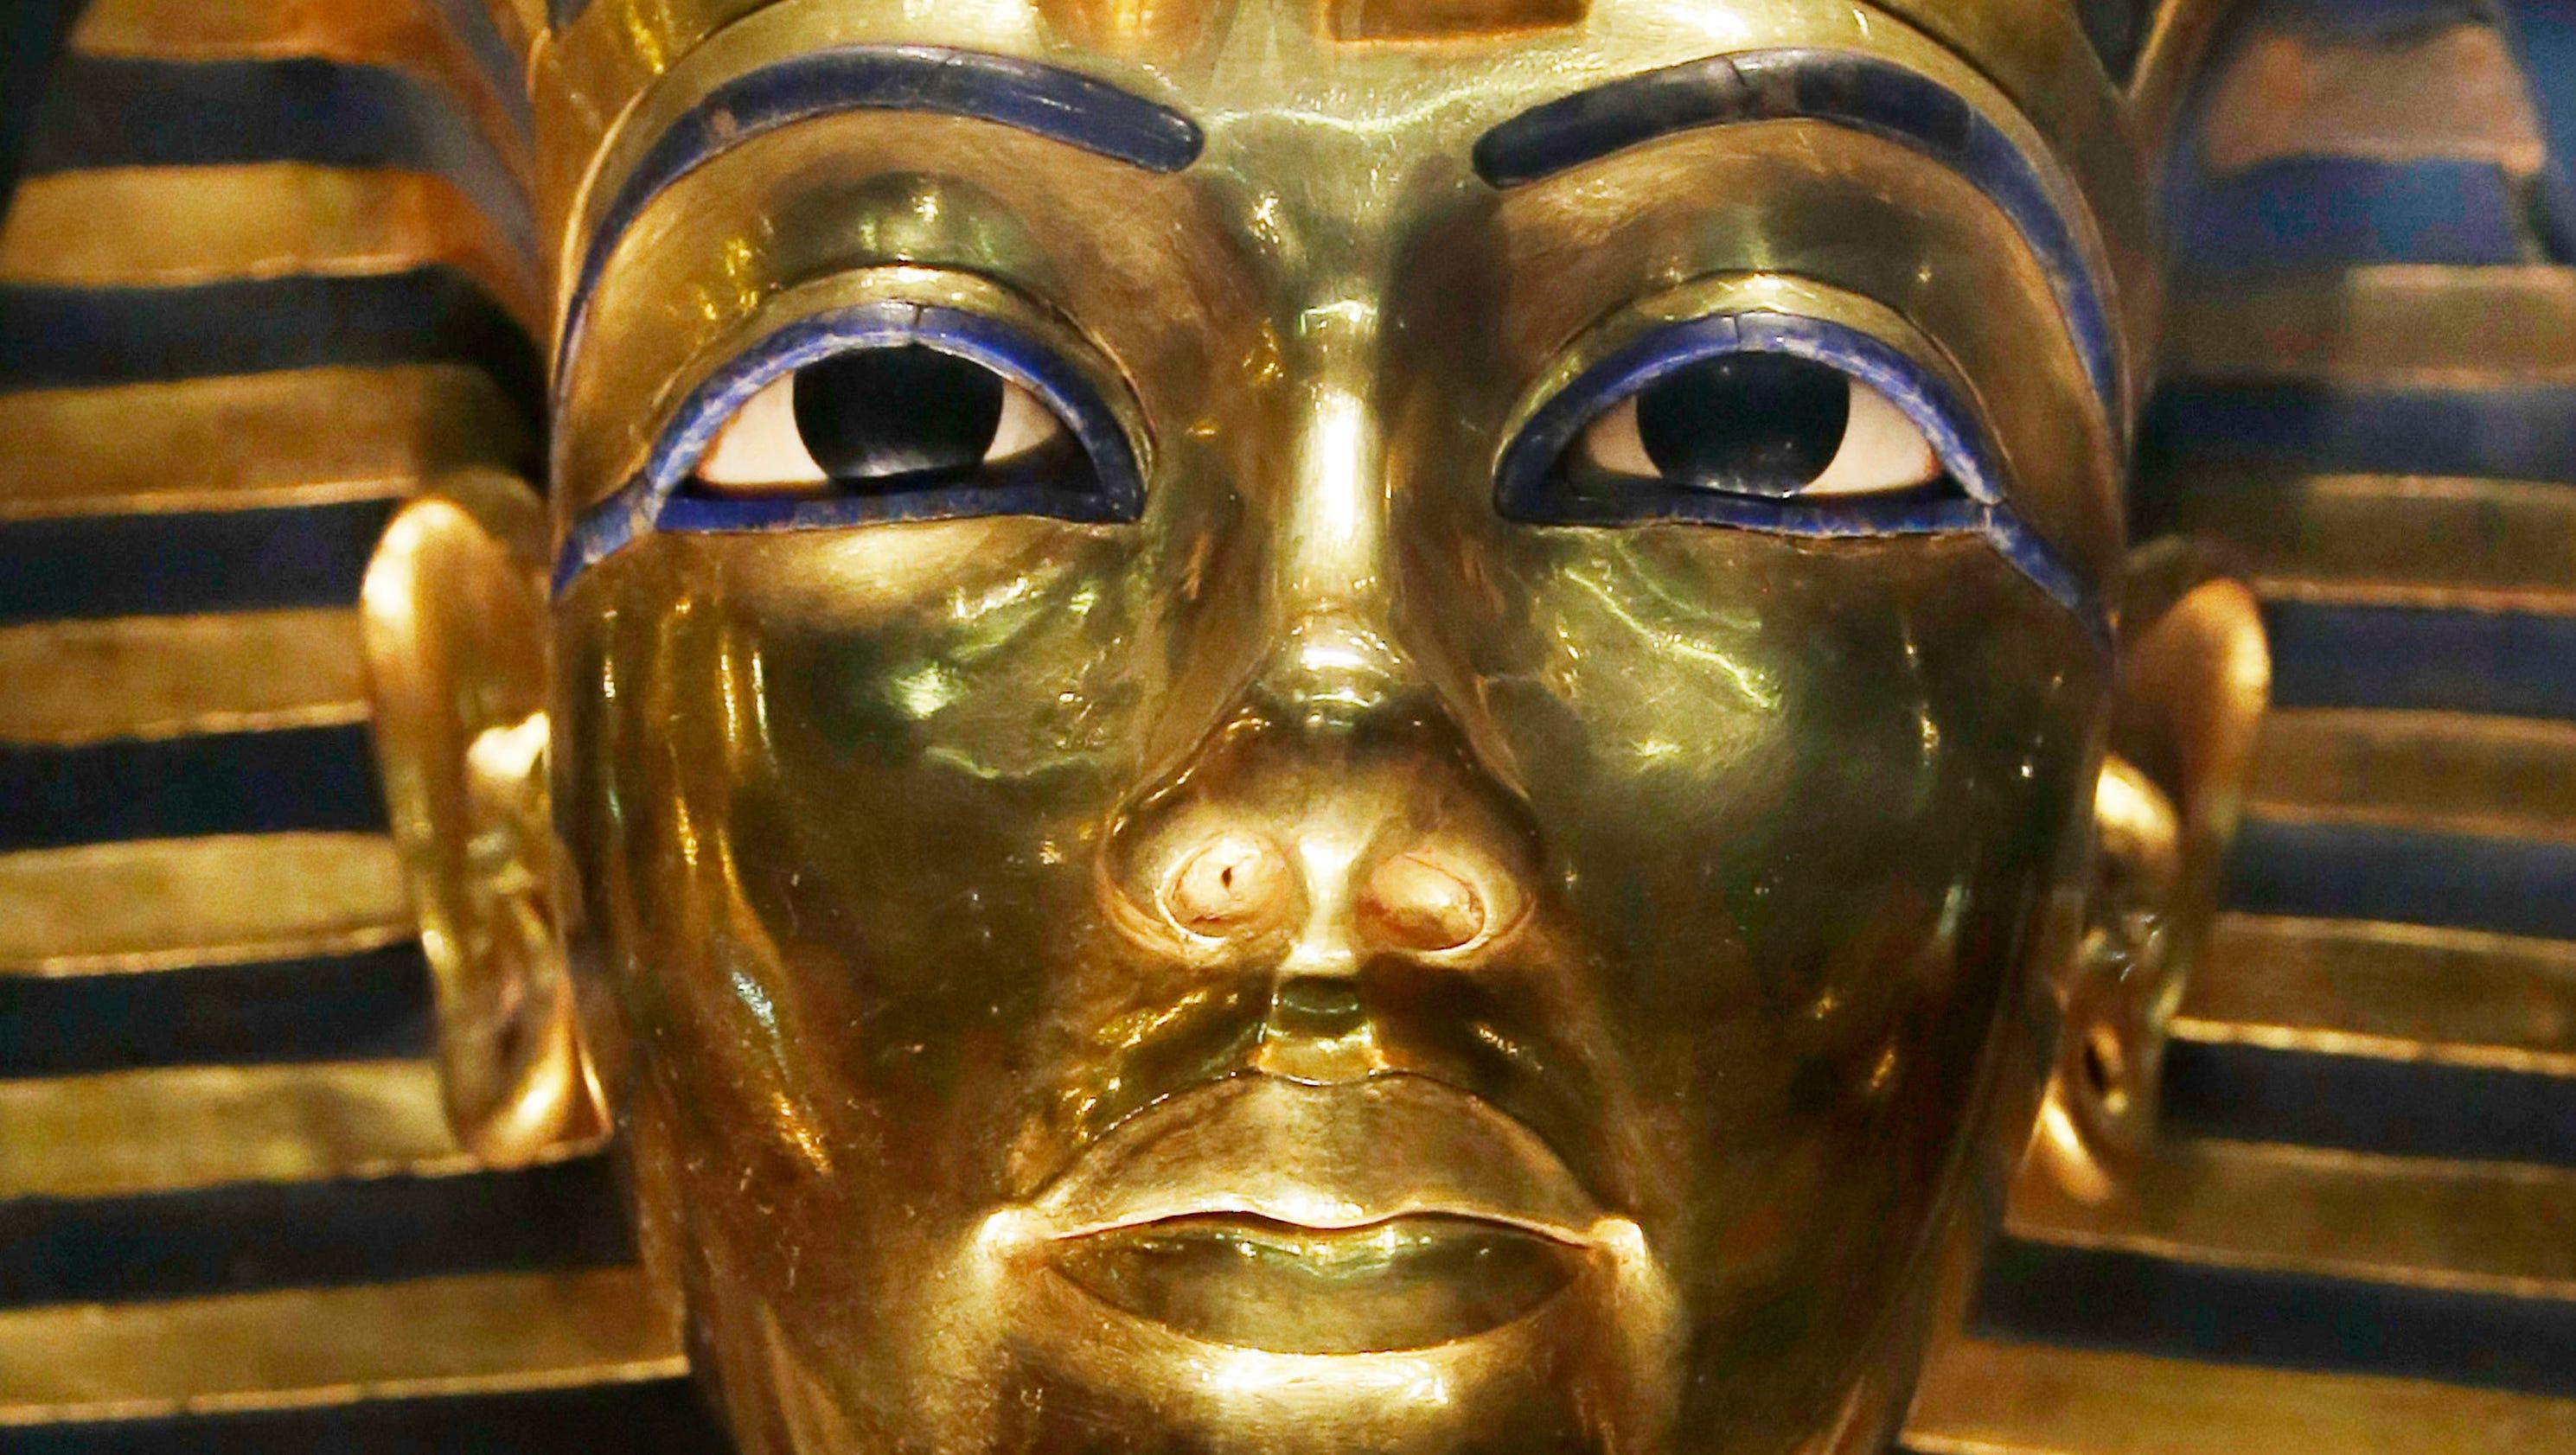 scans of king tut 39 s burial tomb show hidden rooms. Black Bedroom Furniture Sets. Home Design Ideas